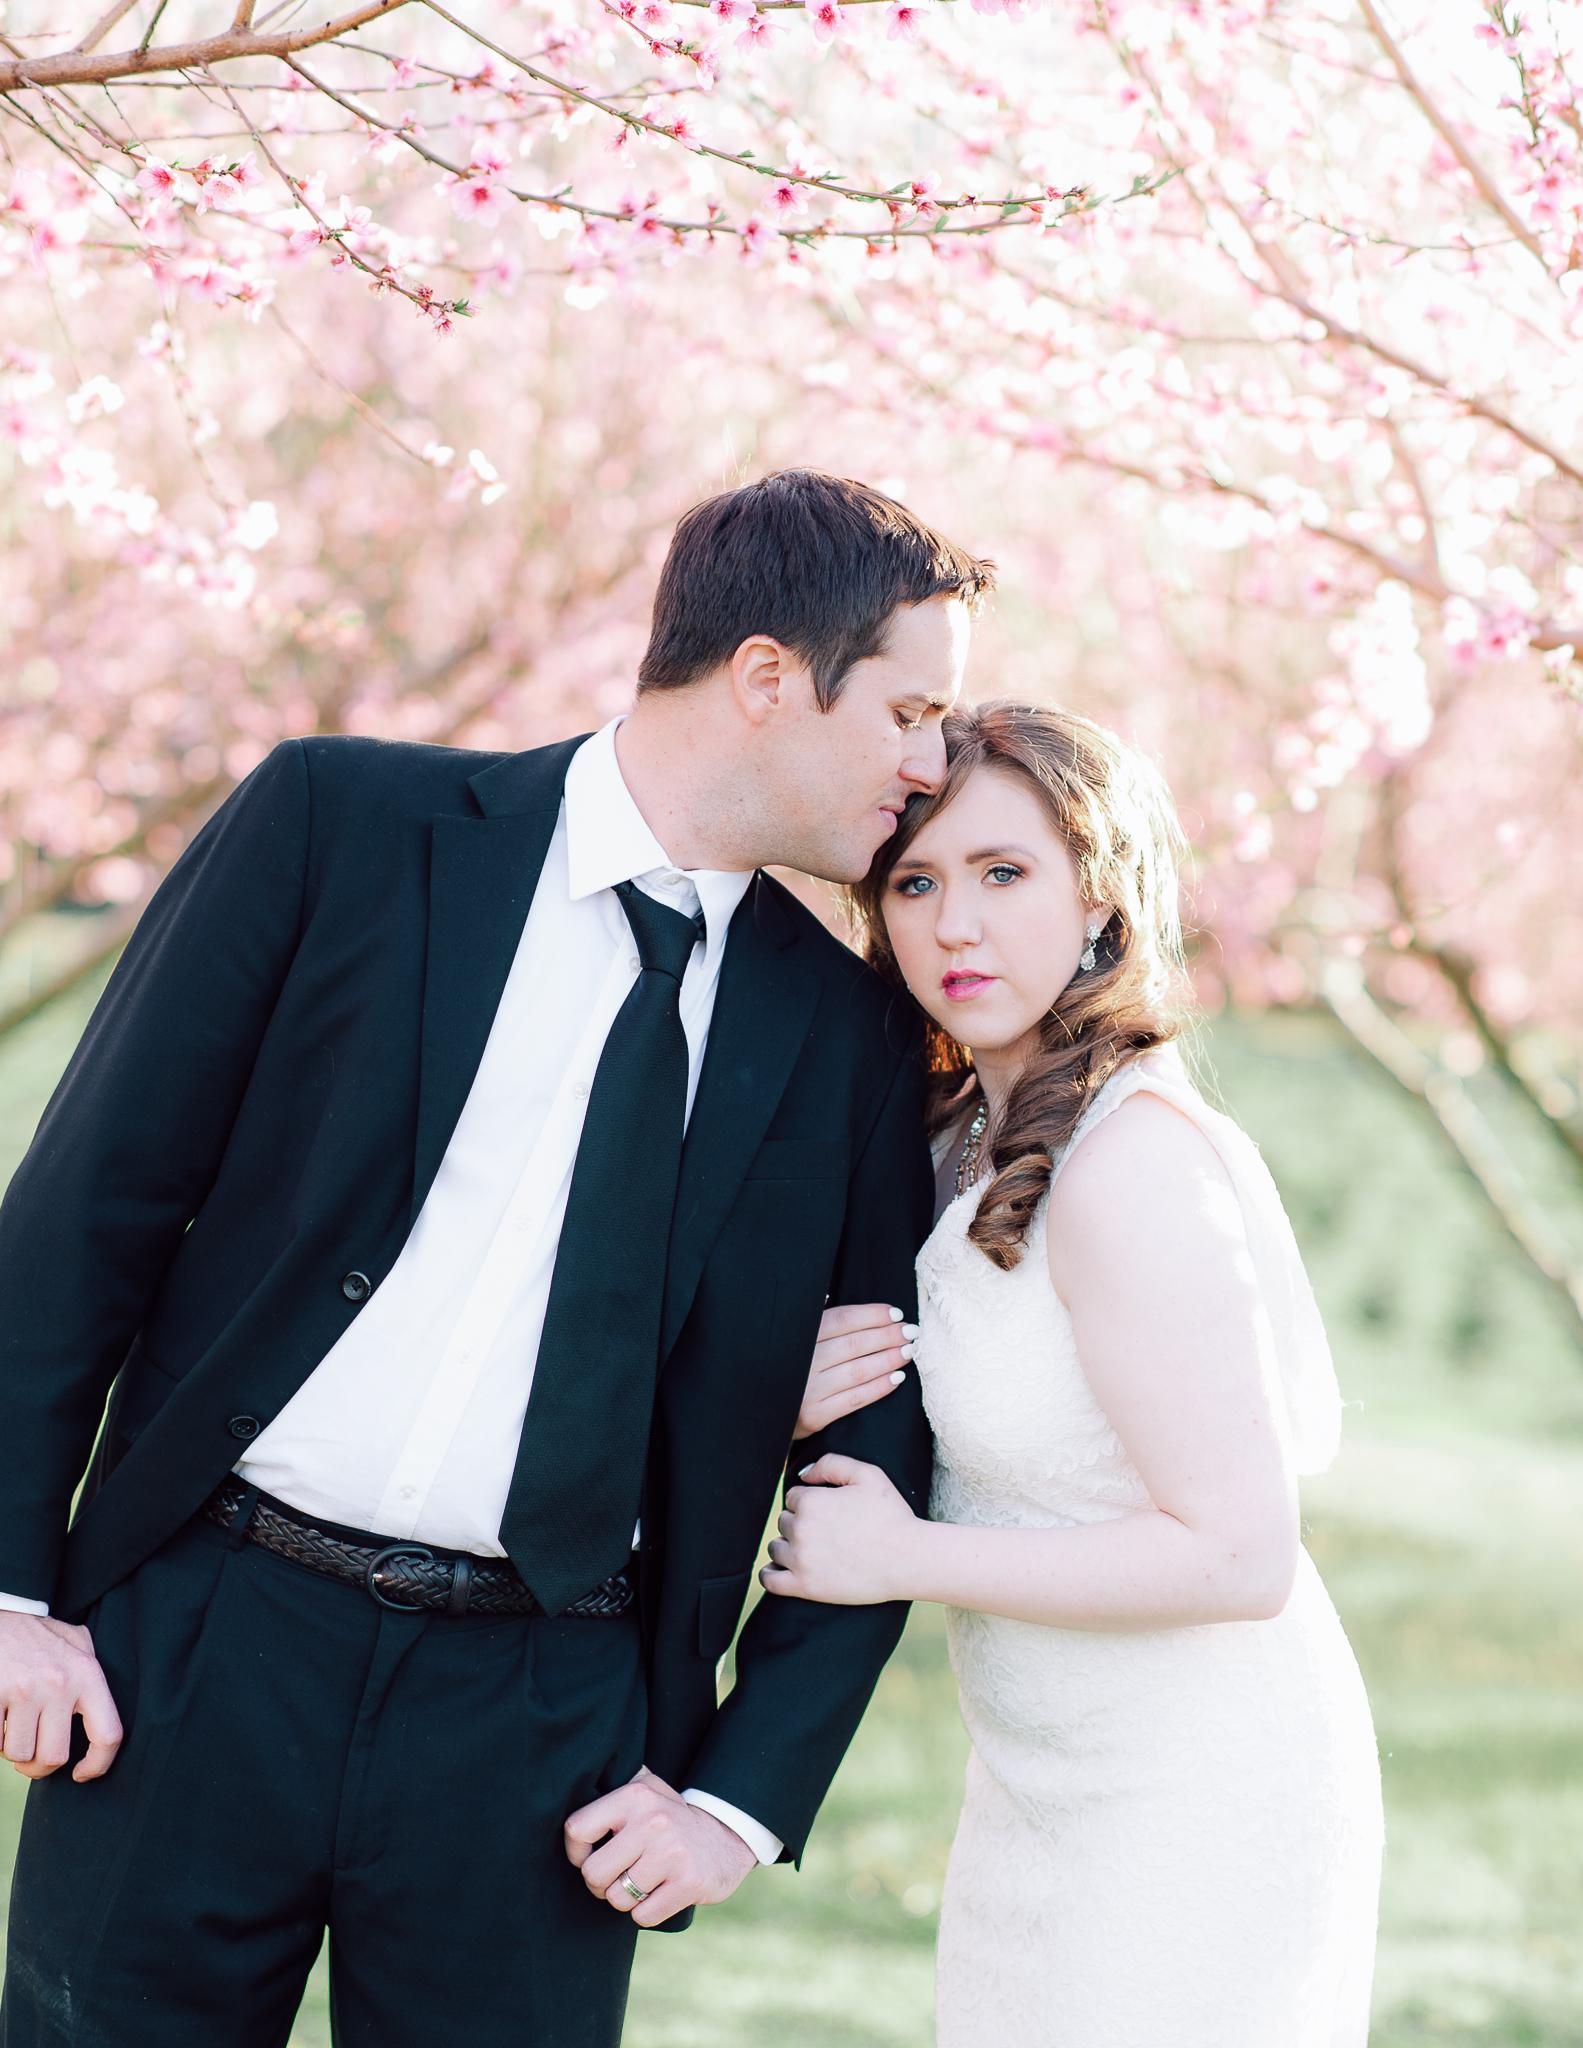 springwedding_cherryblossoms_virginiaphotographer_youseephotography_styledshoot (552).jpg